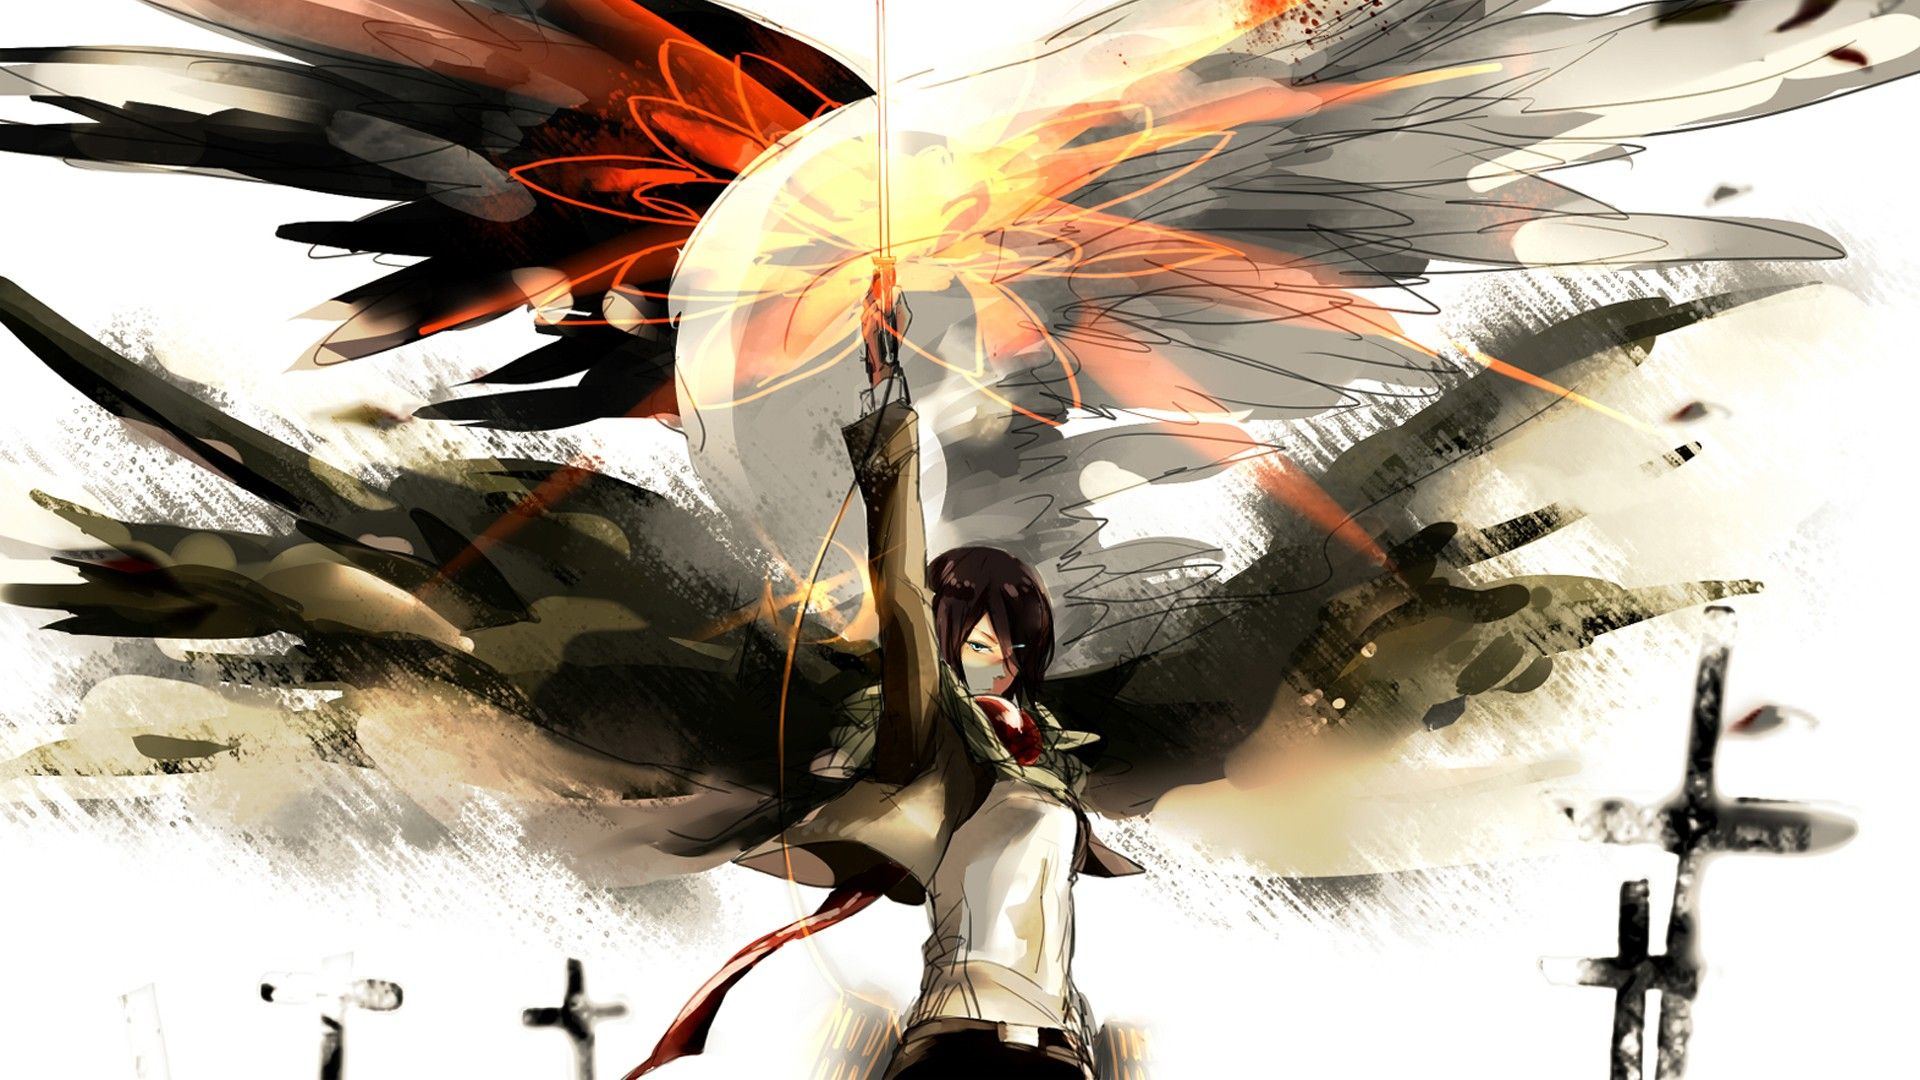 Anime Attack On Titan Wallpaper Attack On Titan Anime Cool Anime Wallpapers Anime Wallpaper